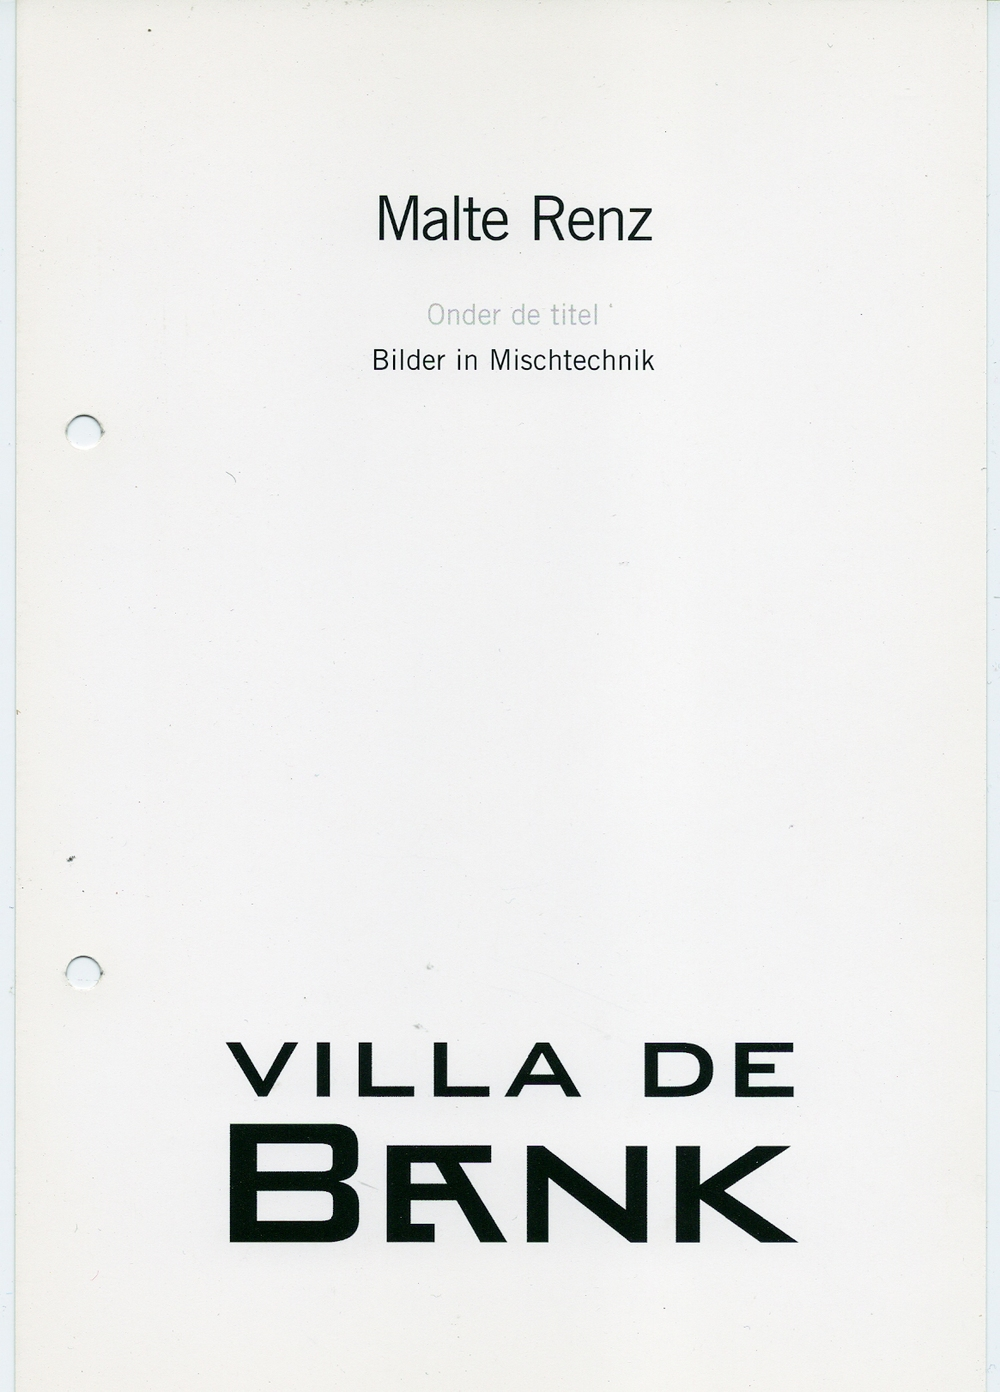 Malte Renz, Bilder in Mischtechnik , 2004